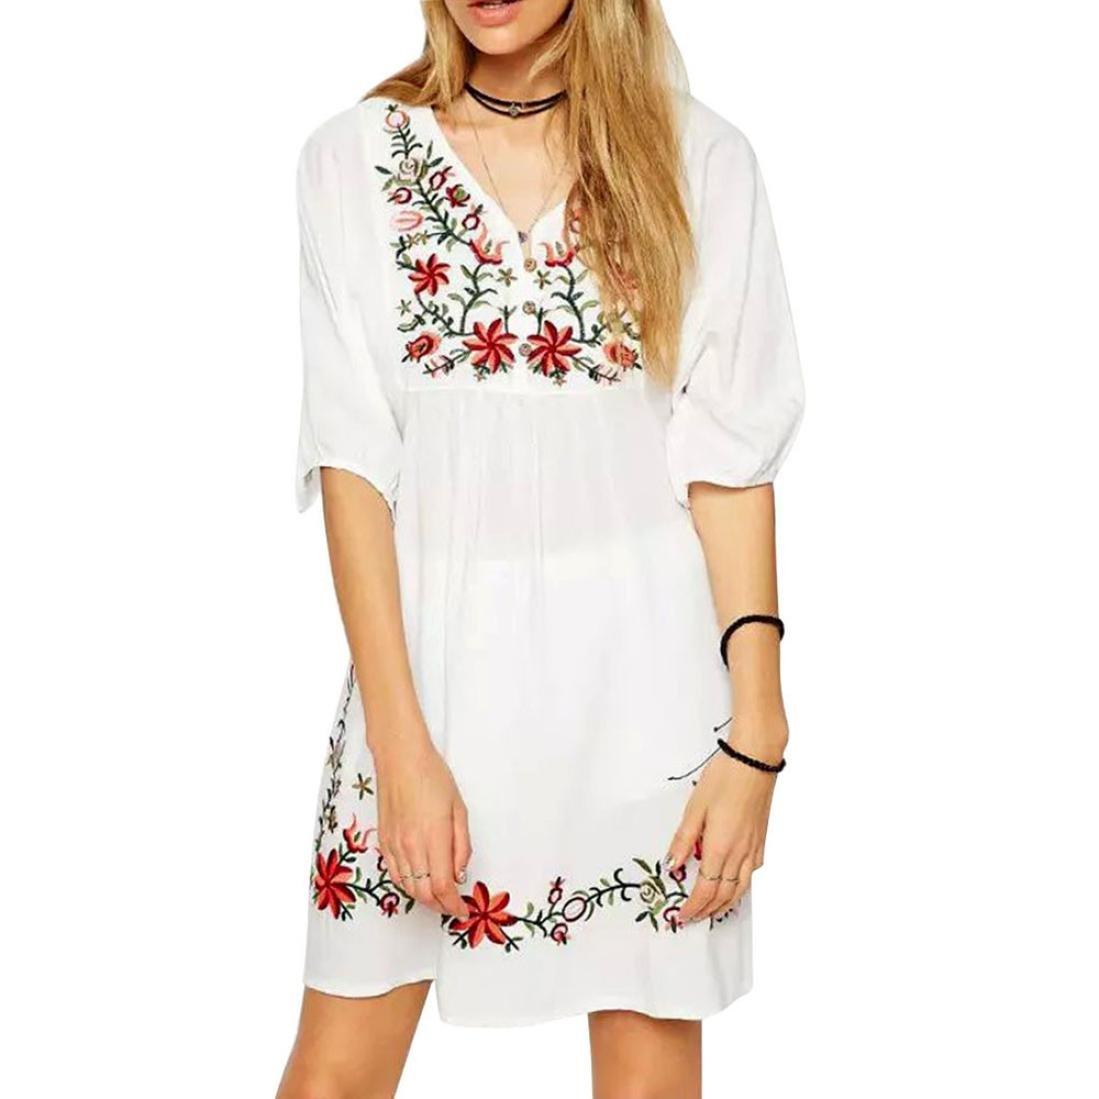 kaifongfu Women Dress, Mexican Ethnic Embroidered Pessant Hippie Blouse Gypsy Boho Mini Dress (S, White)